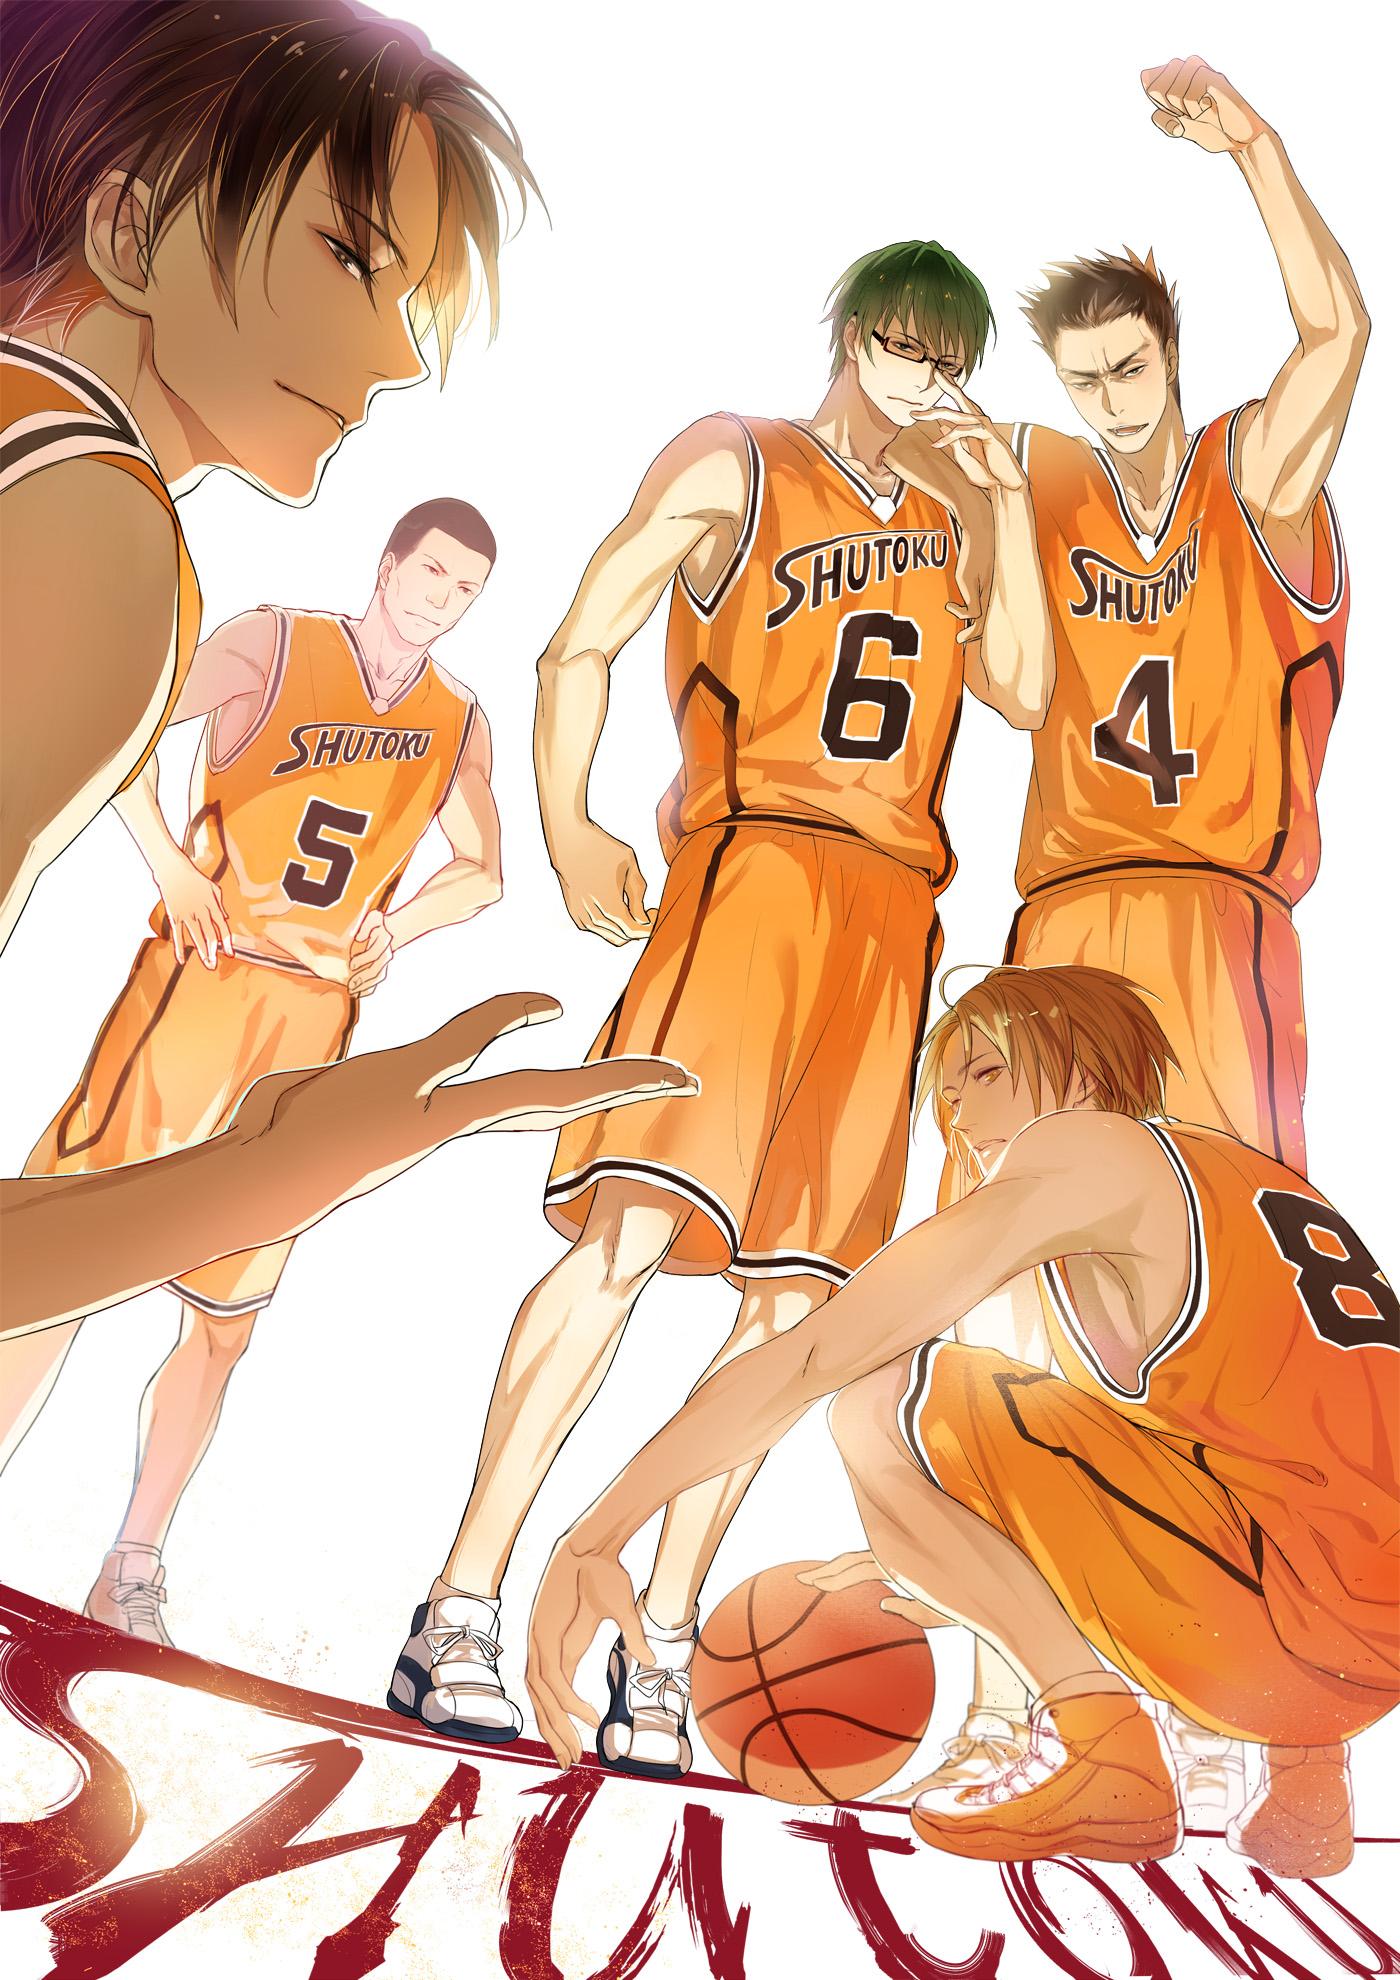 anime_wallpaper_Kuroko_no_basket_8488484993.jpg